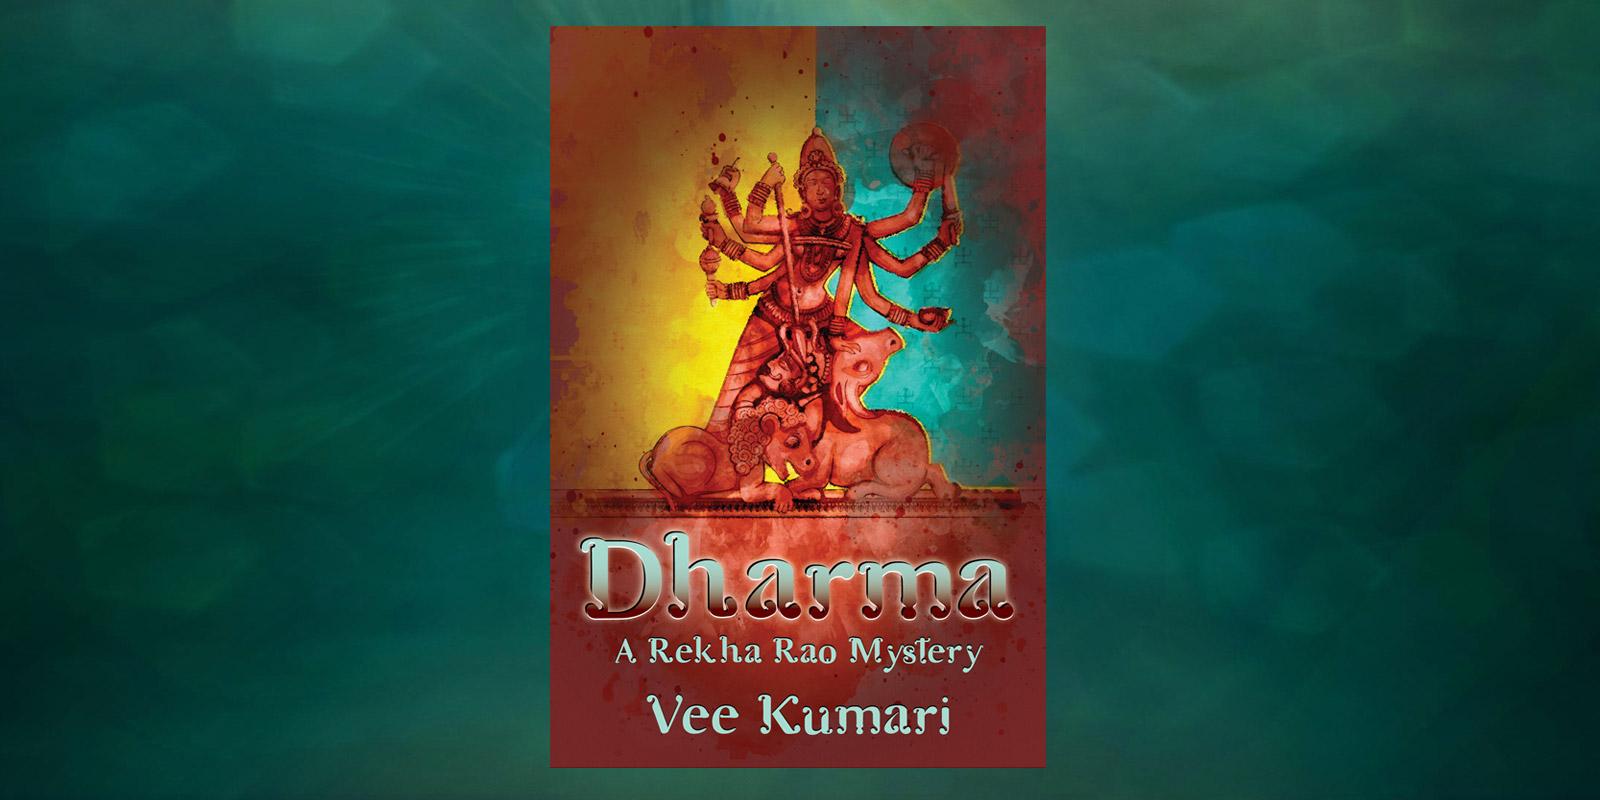 Dharma-A-Rekha-Rao-Mystery-by-Vee-Kumari-Header